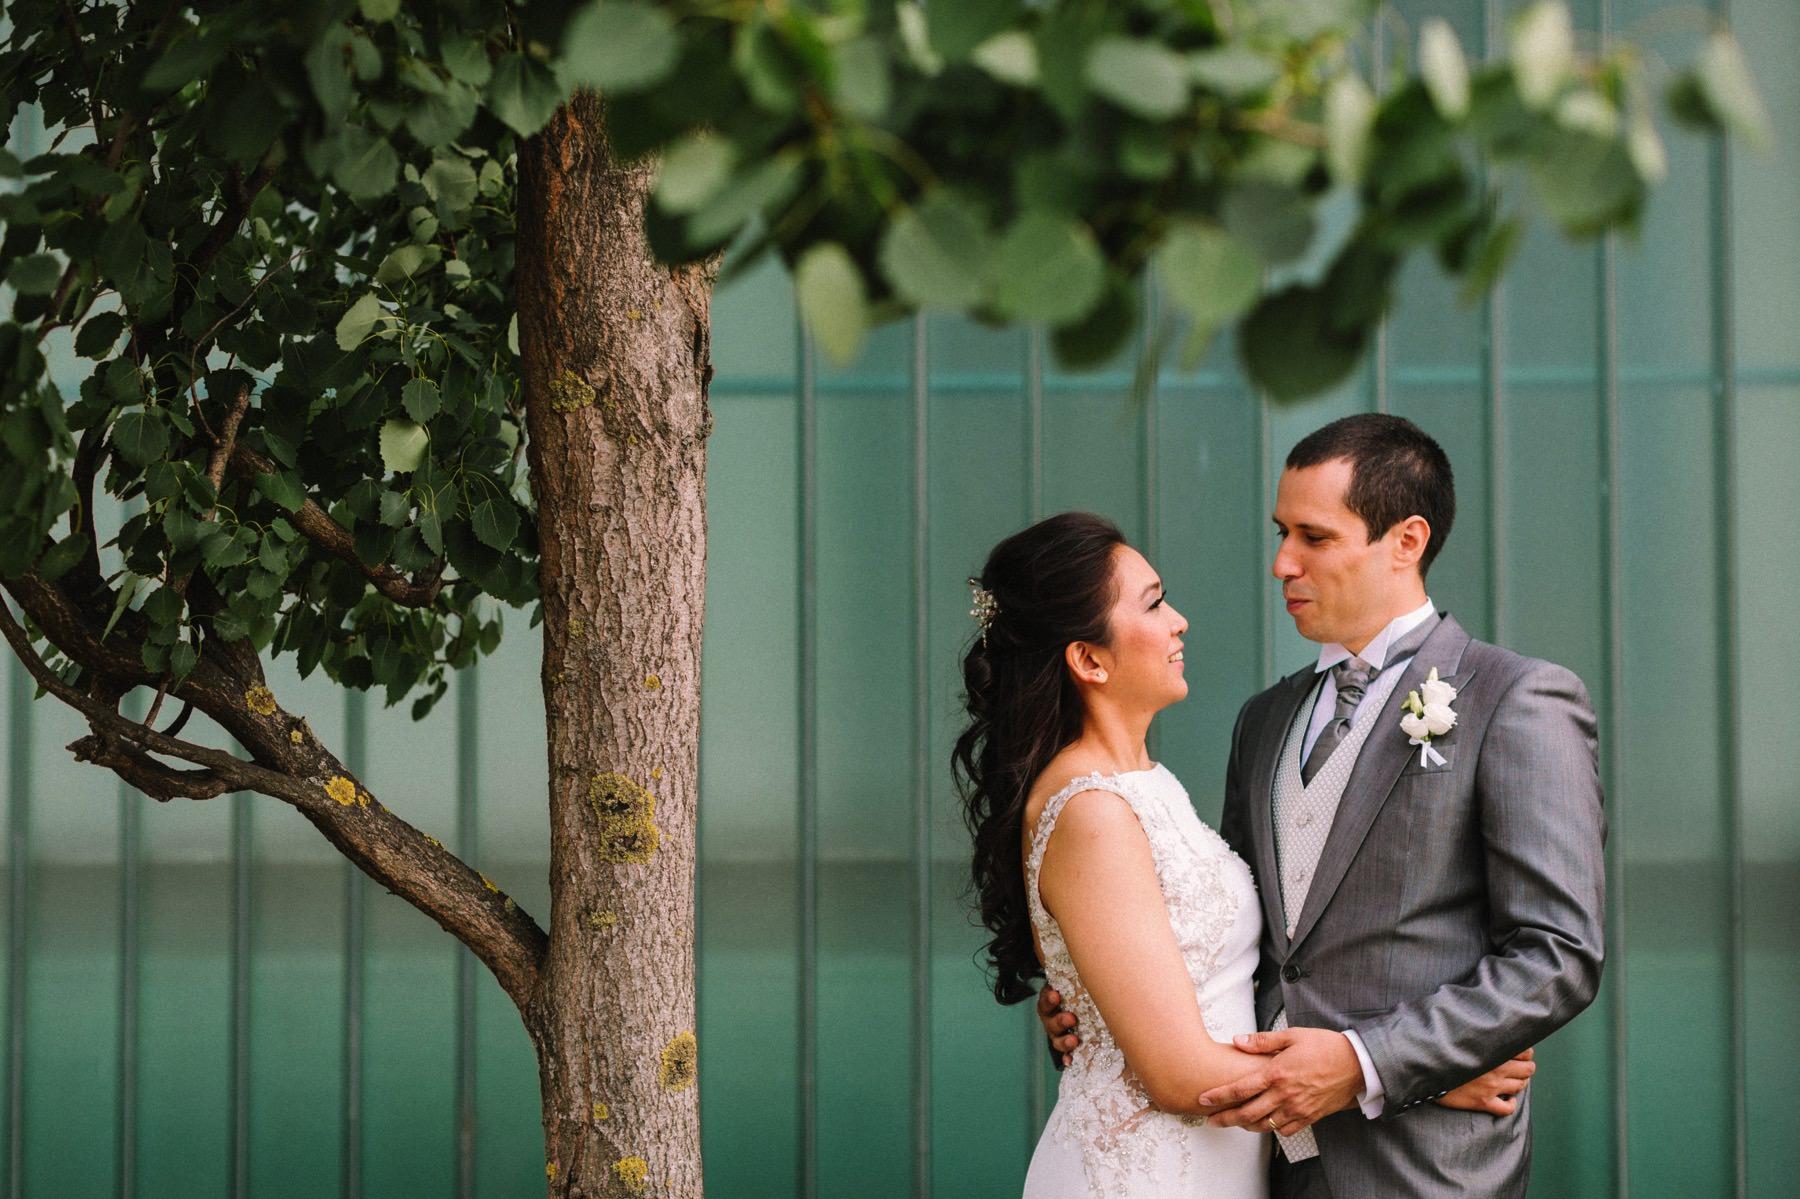 photographer Helsinki wedding